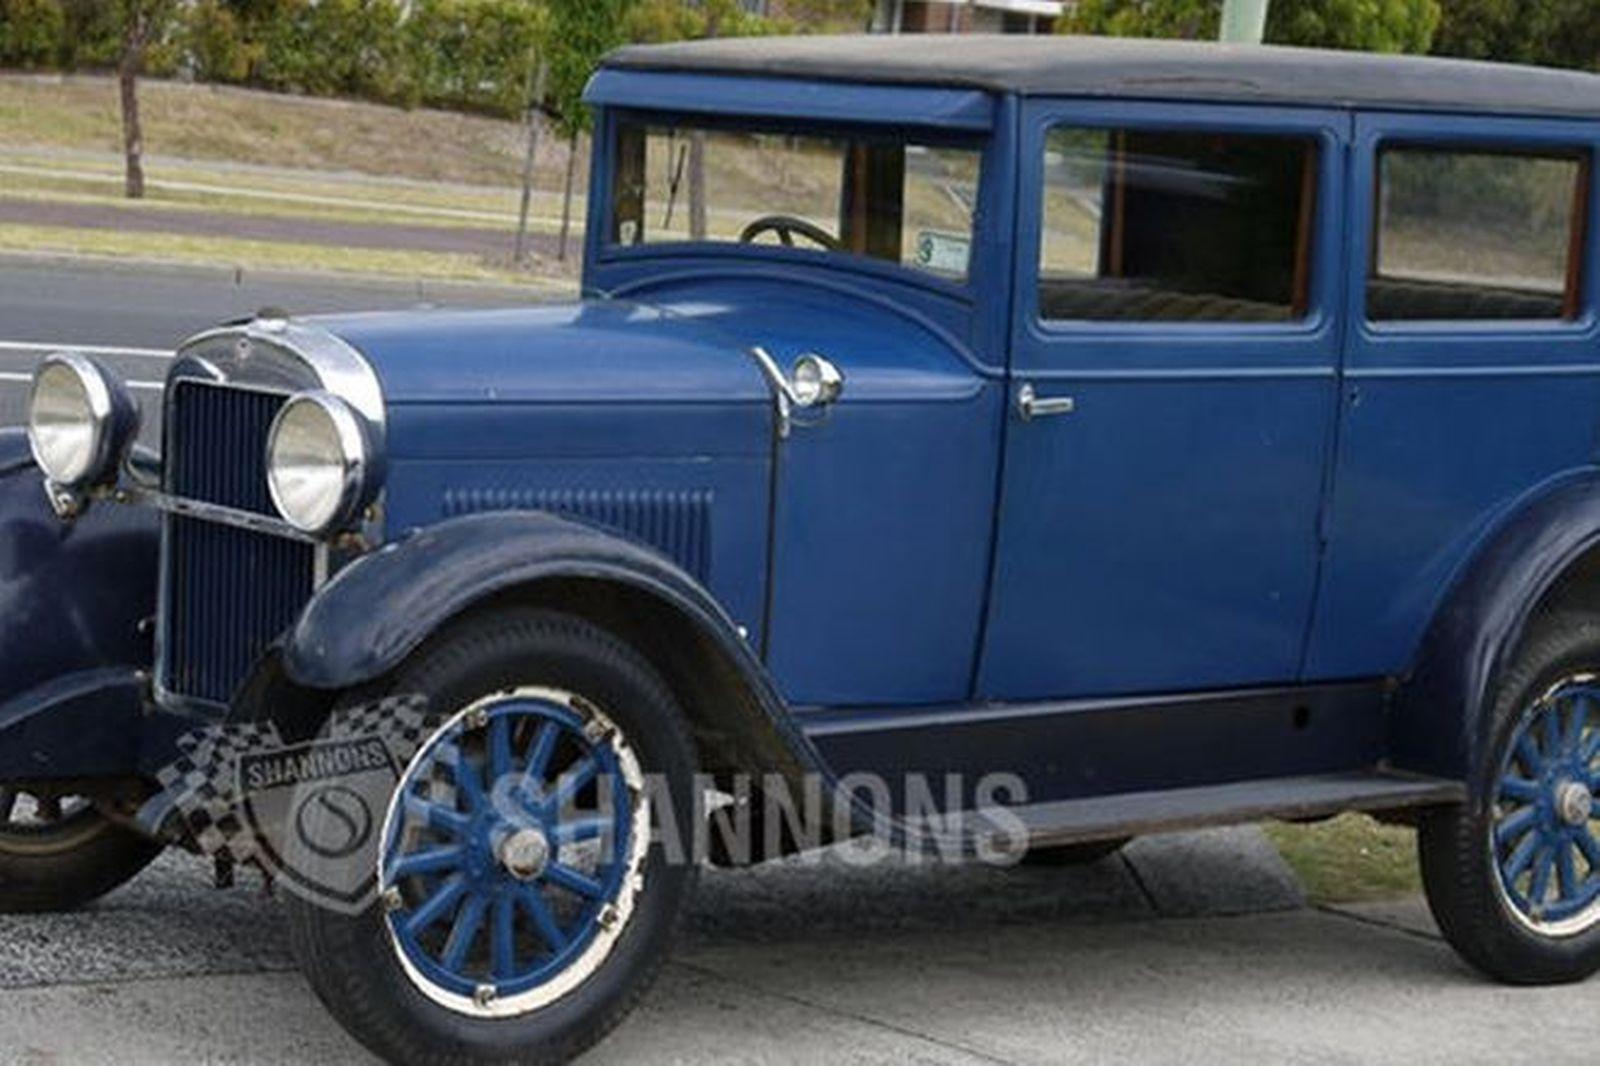 Sold: Essex Super 6 Sedan Auctions - Lot 13 - Shannons